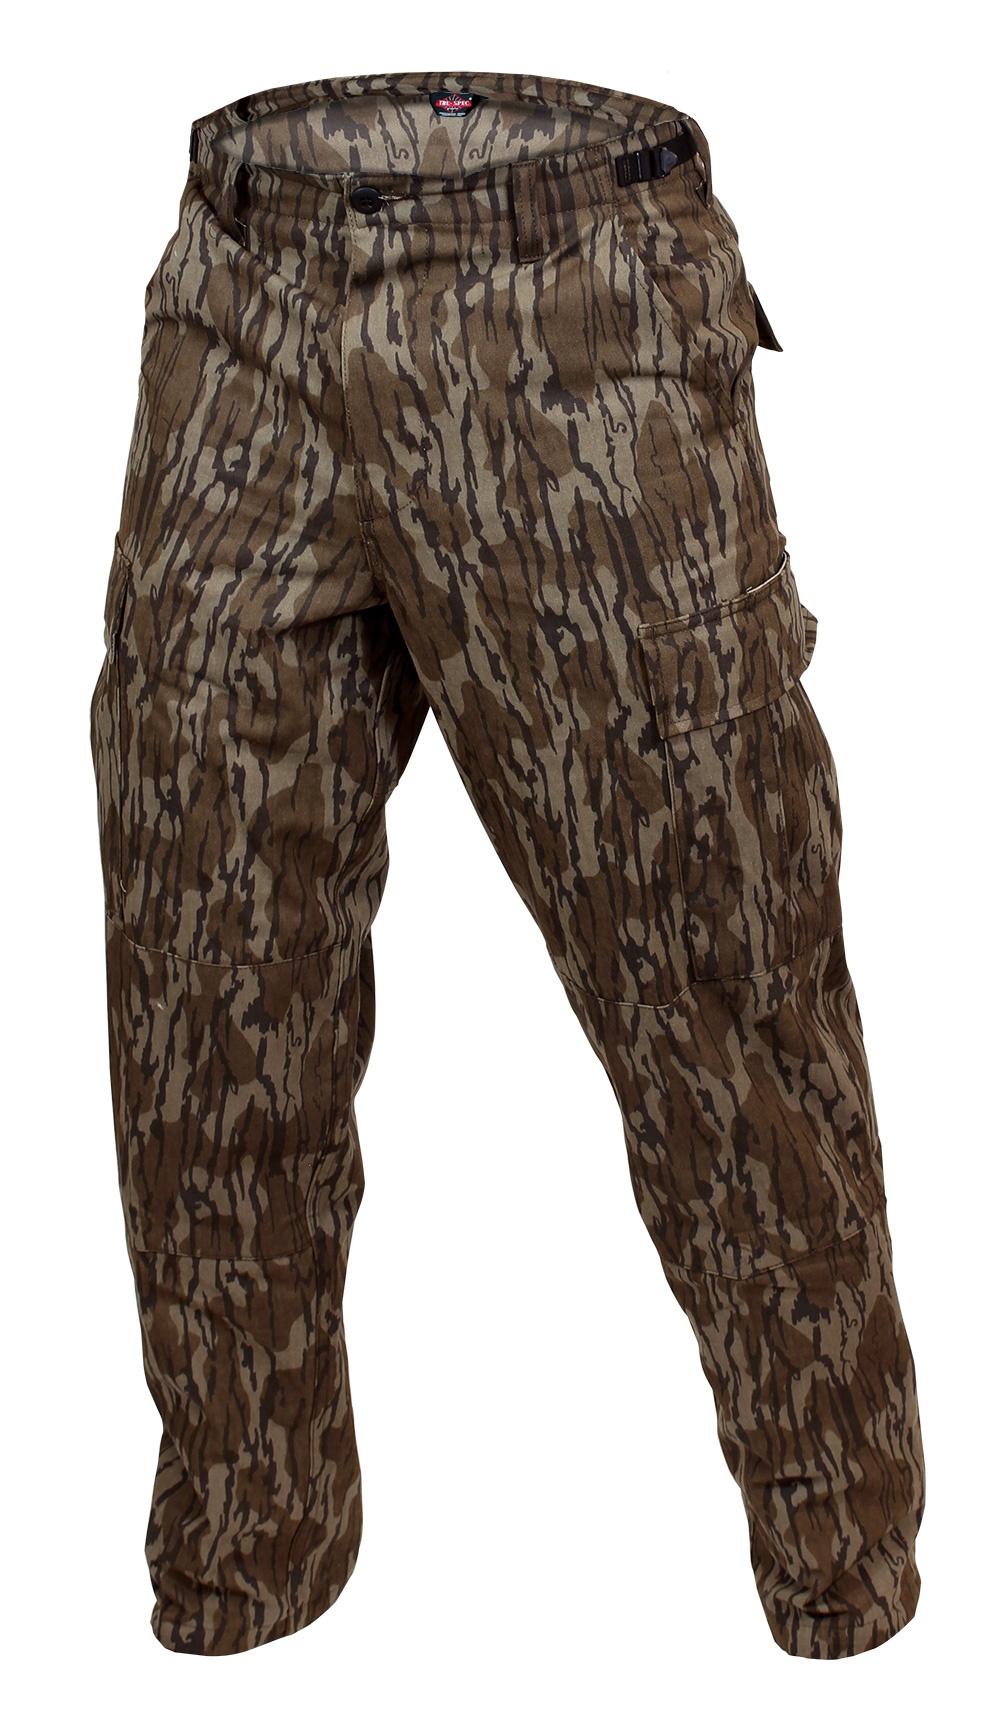 630ff8006 TRU-SPEC BDU Pants – Original Bottomland Camo 100% Cotton LRG 36-38 YN003